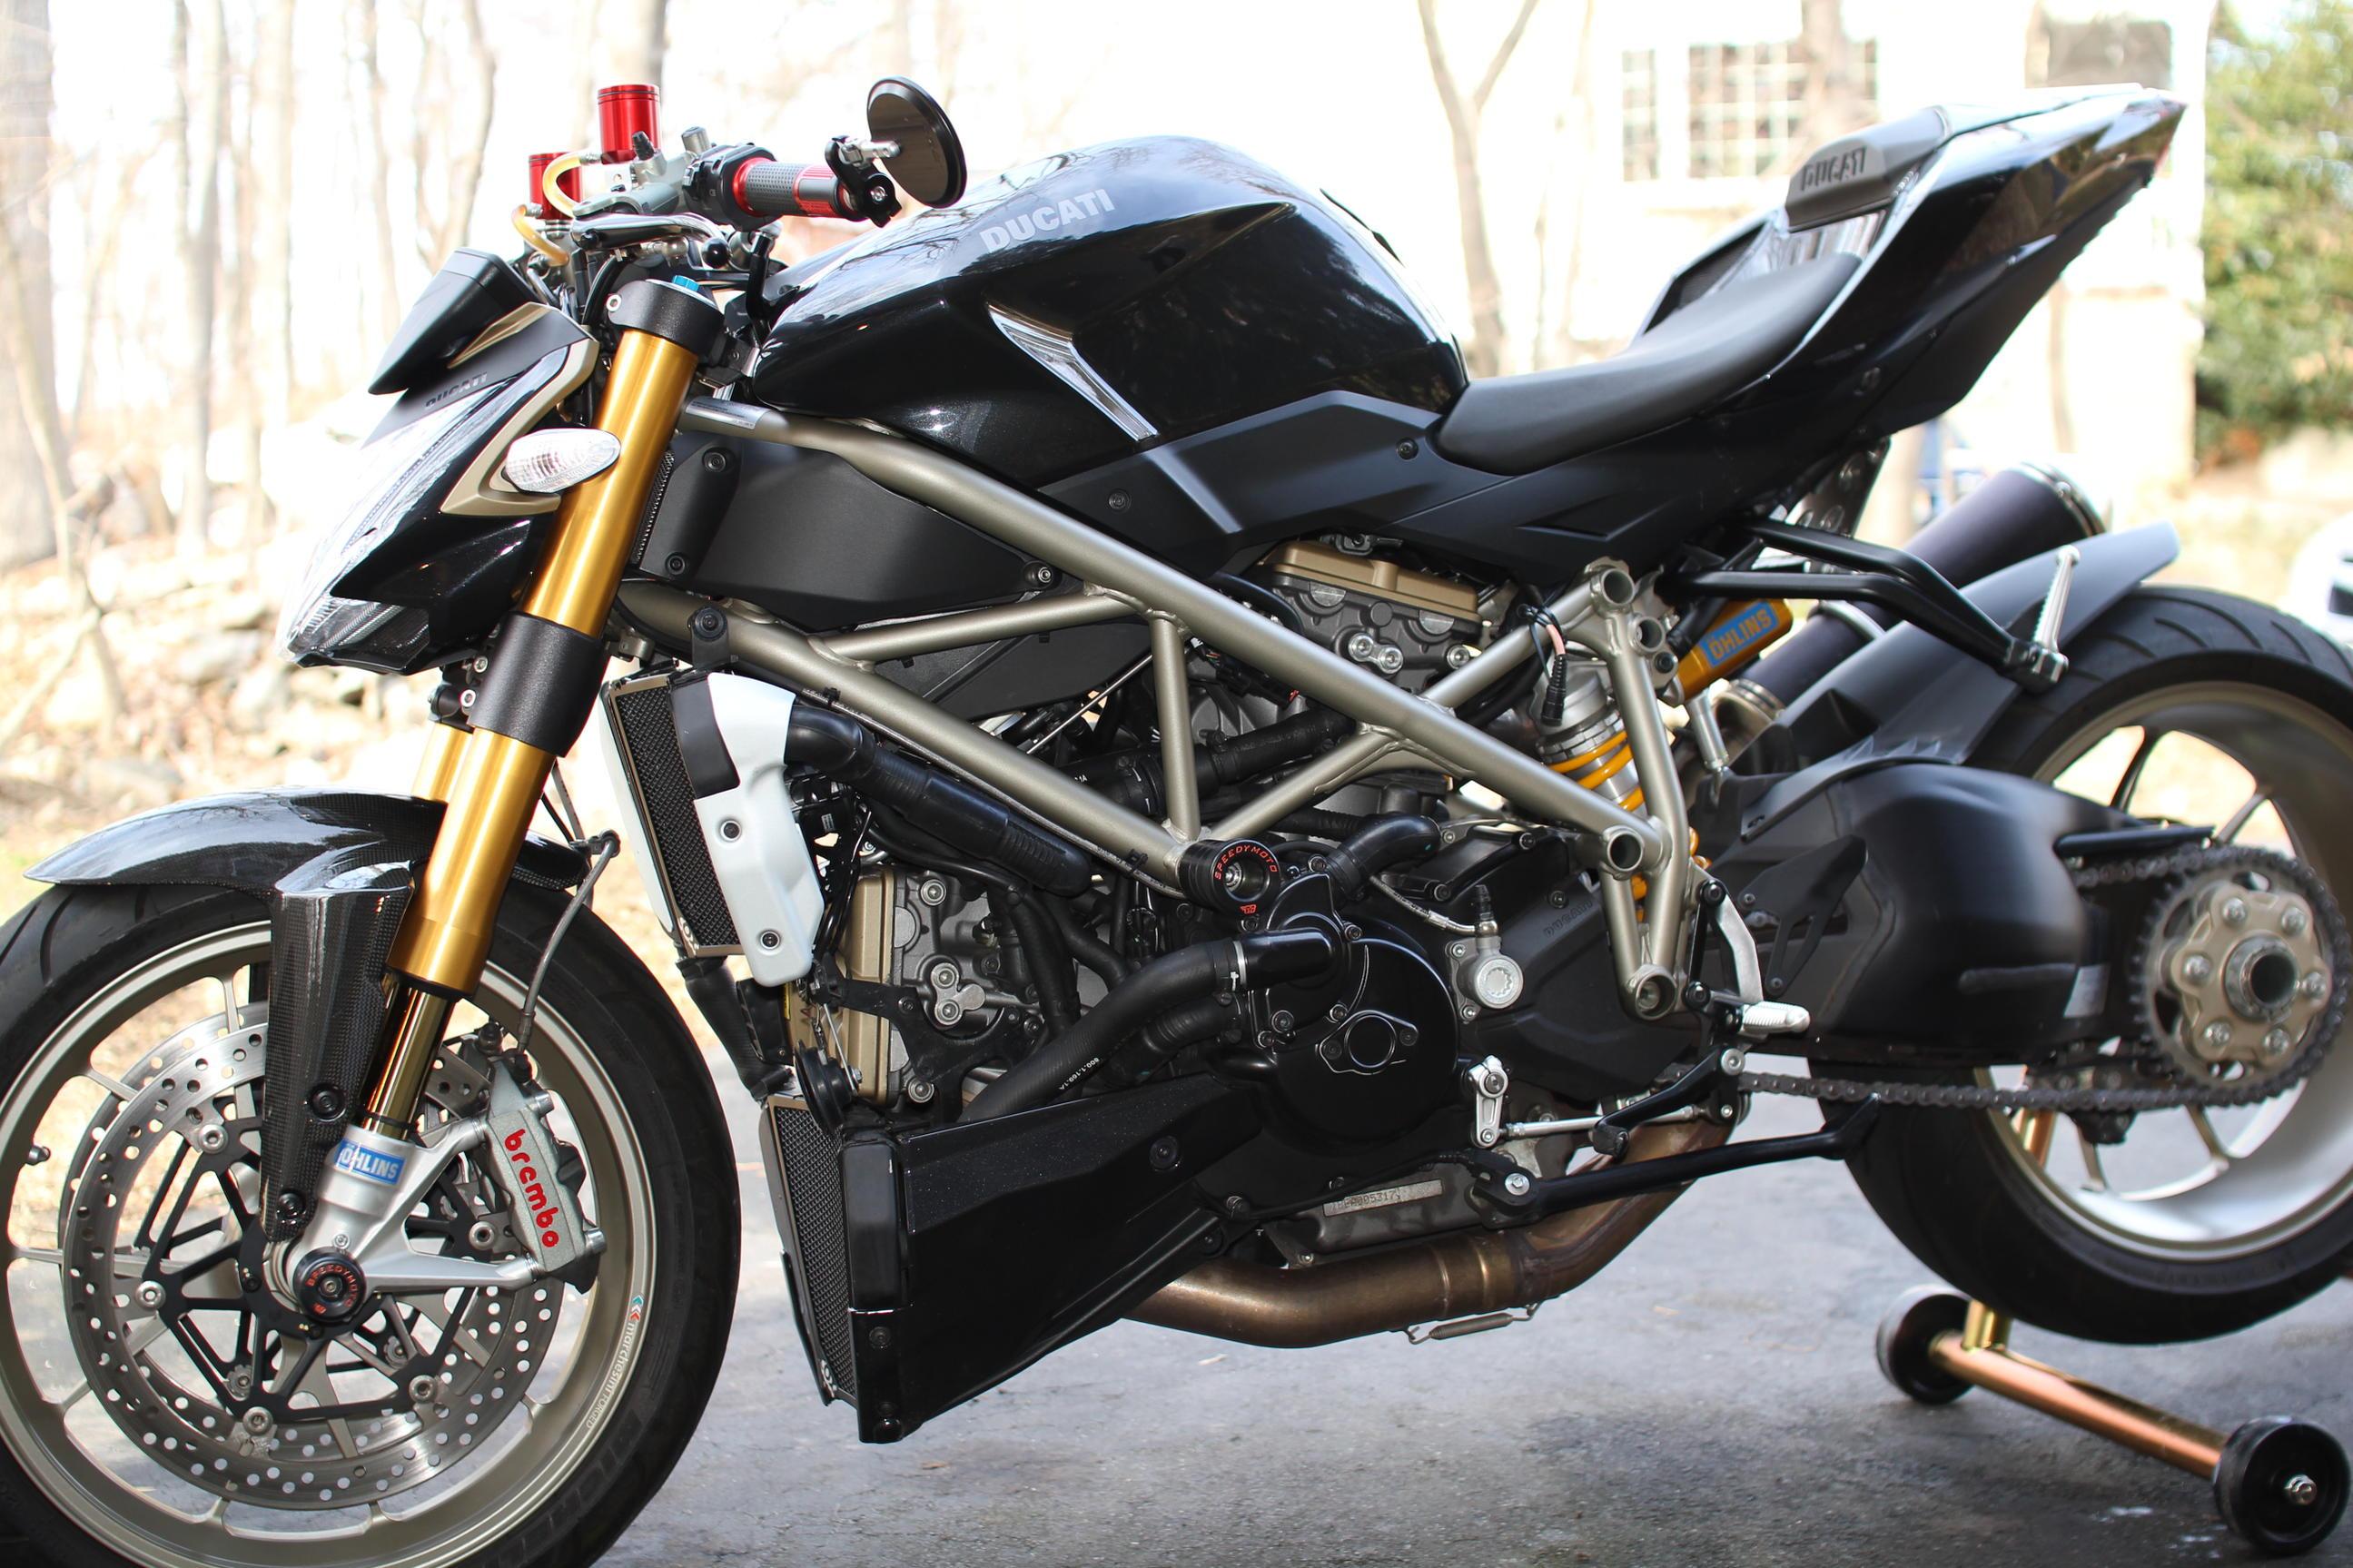 2010 Ducati Streetfighter S Black Ducati Org Forum